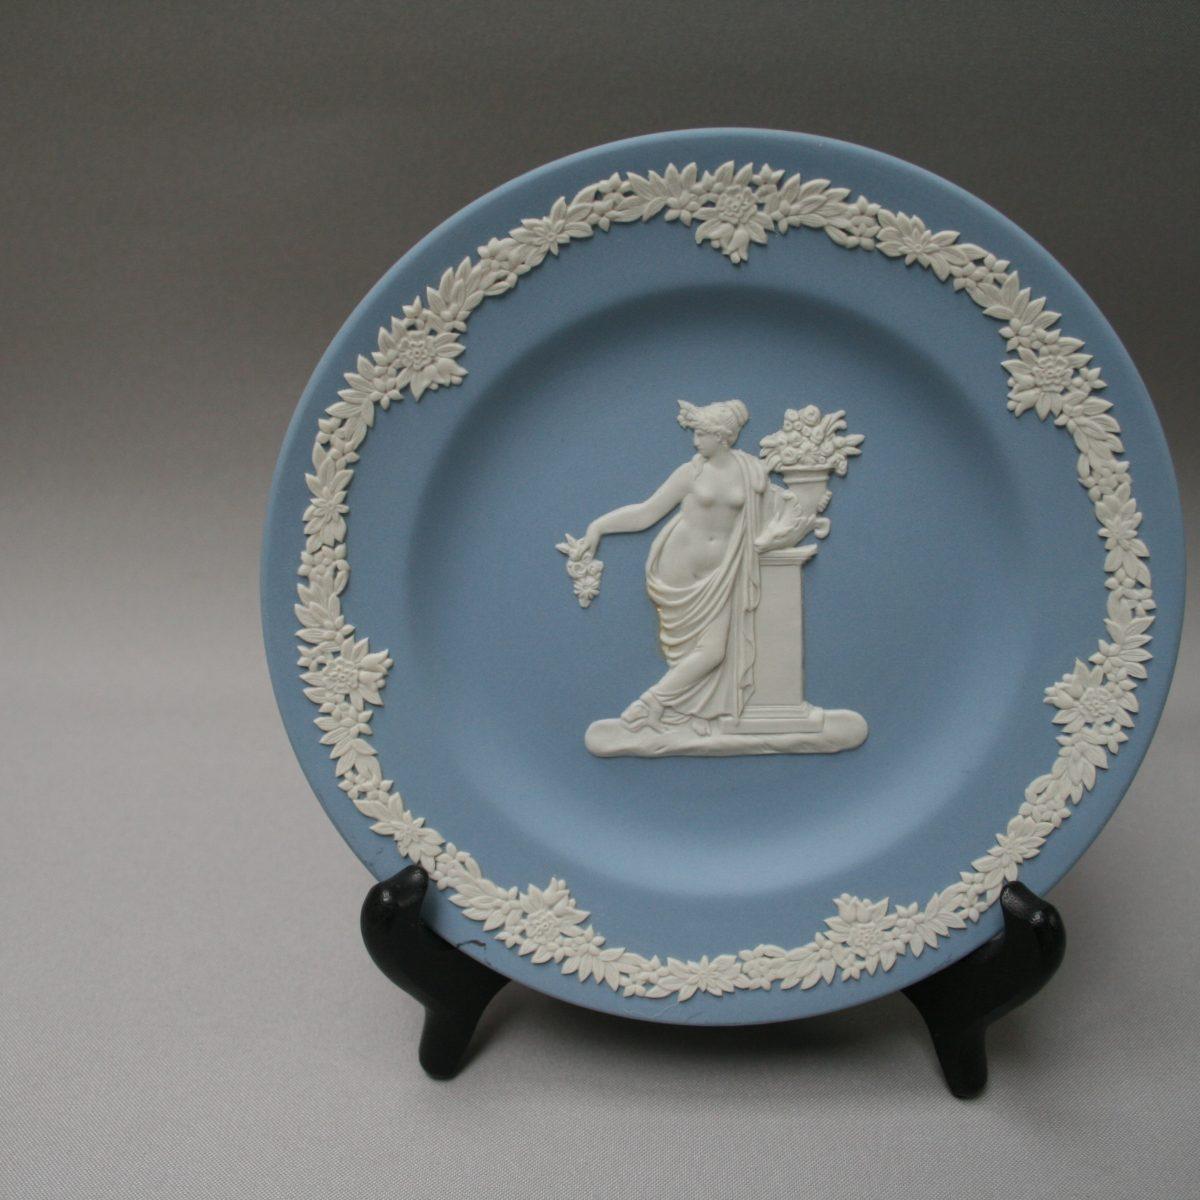 Jasperware plate by Wedgwood/williamsantiques